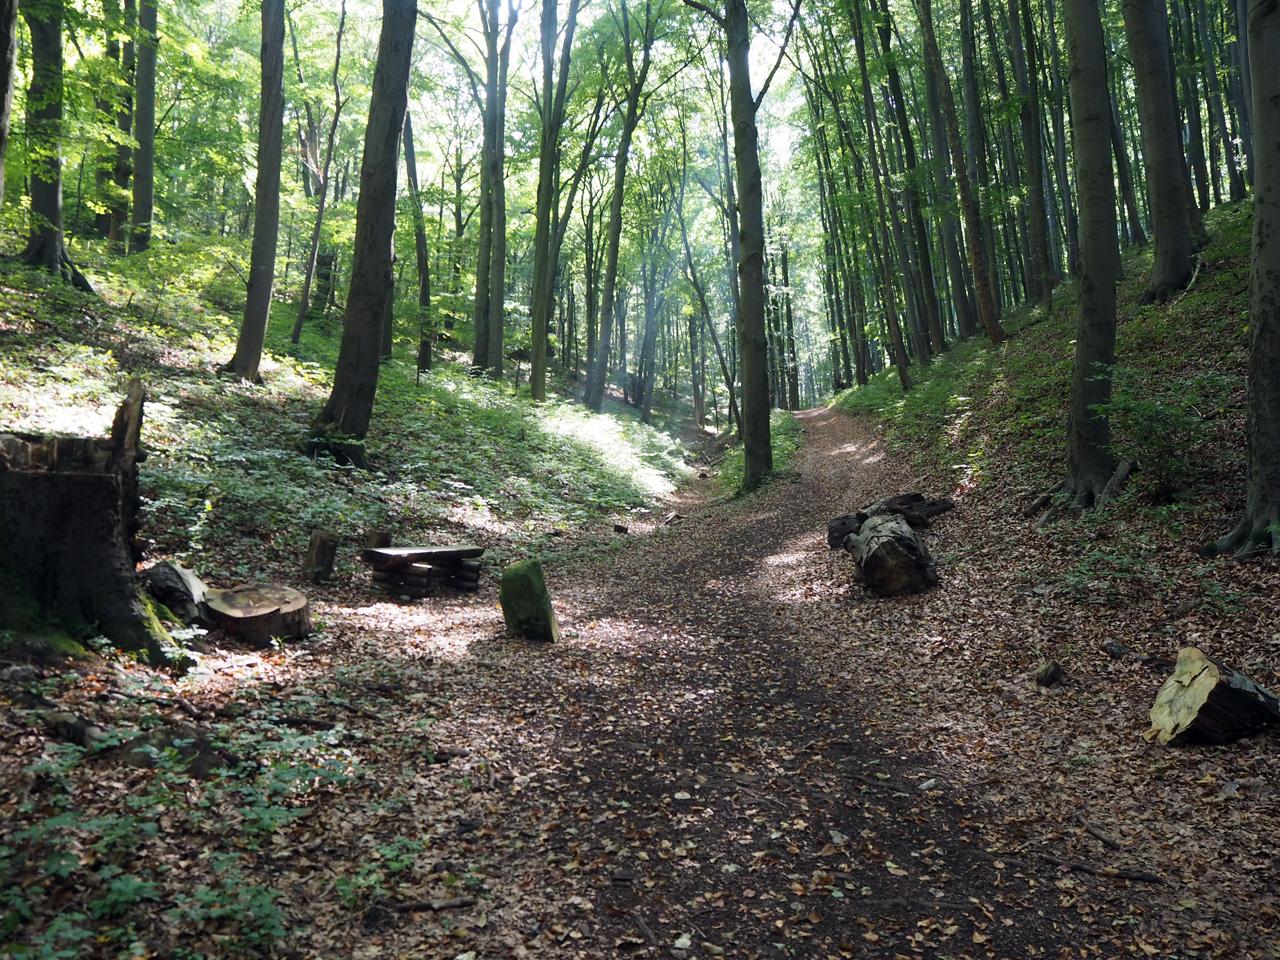 beklimming van de Grosser Hörselberg